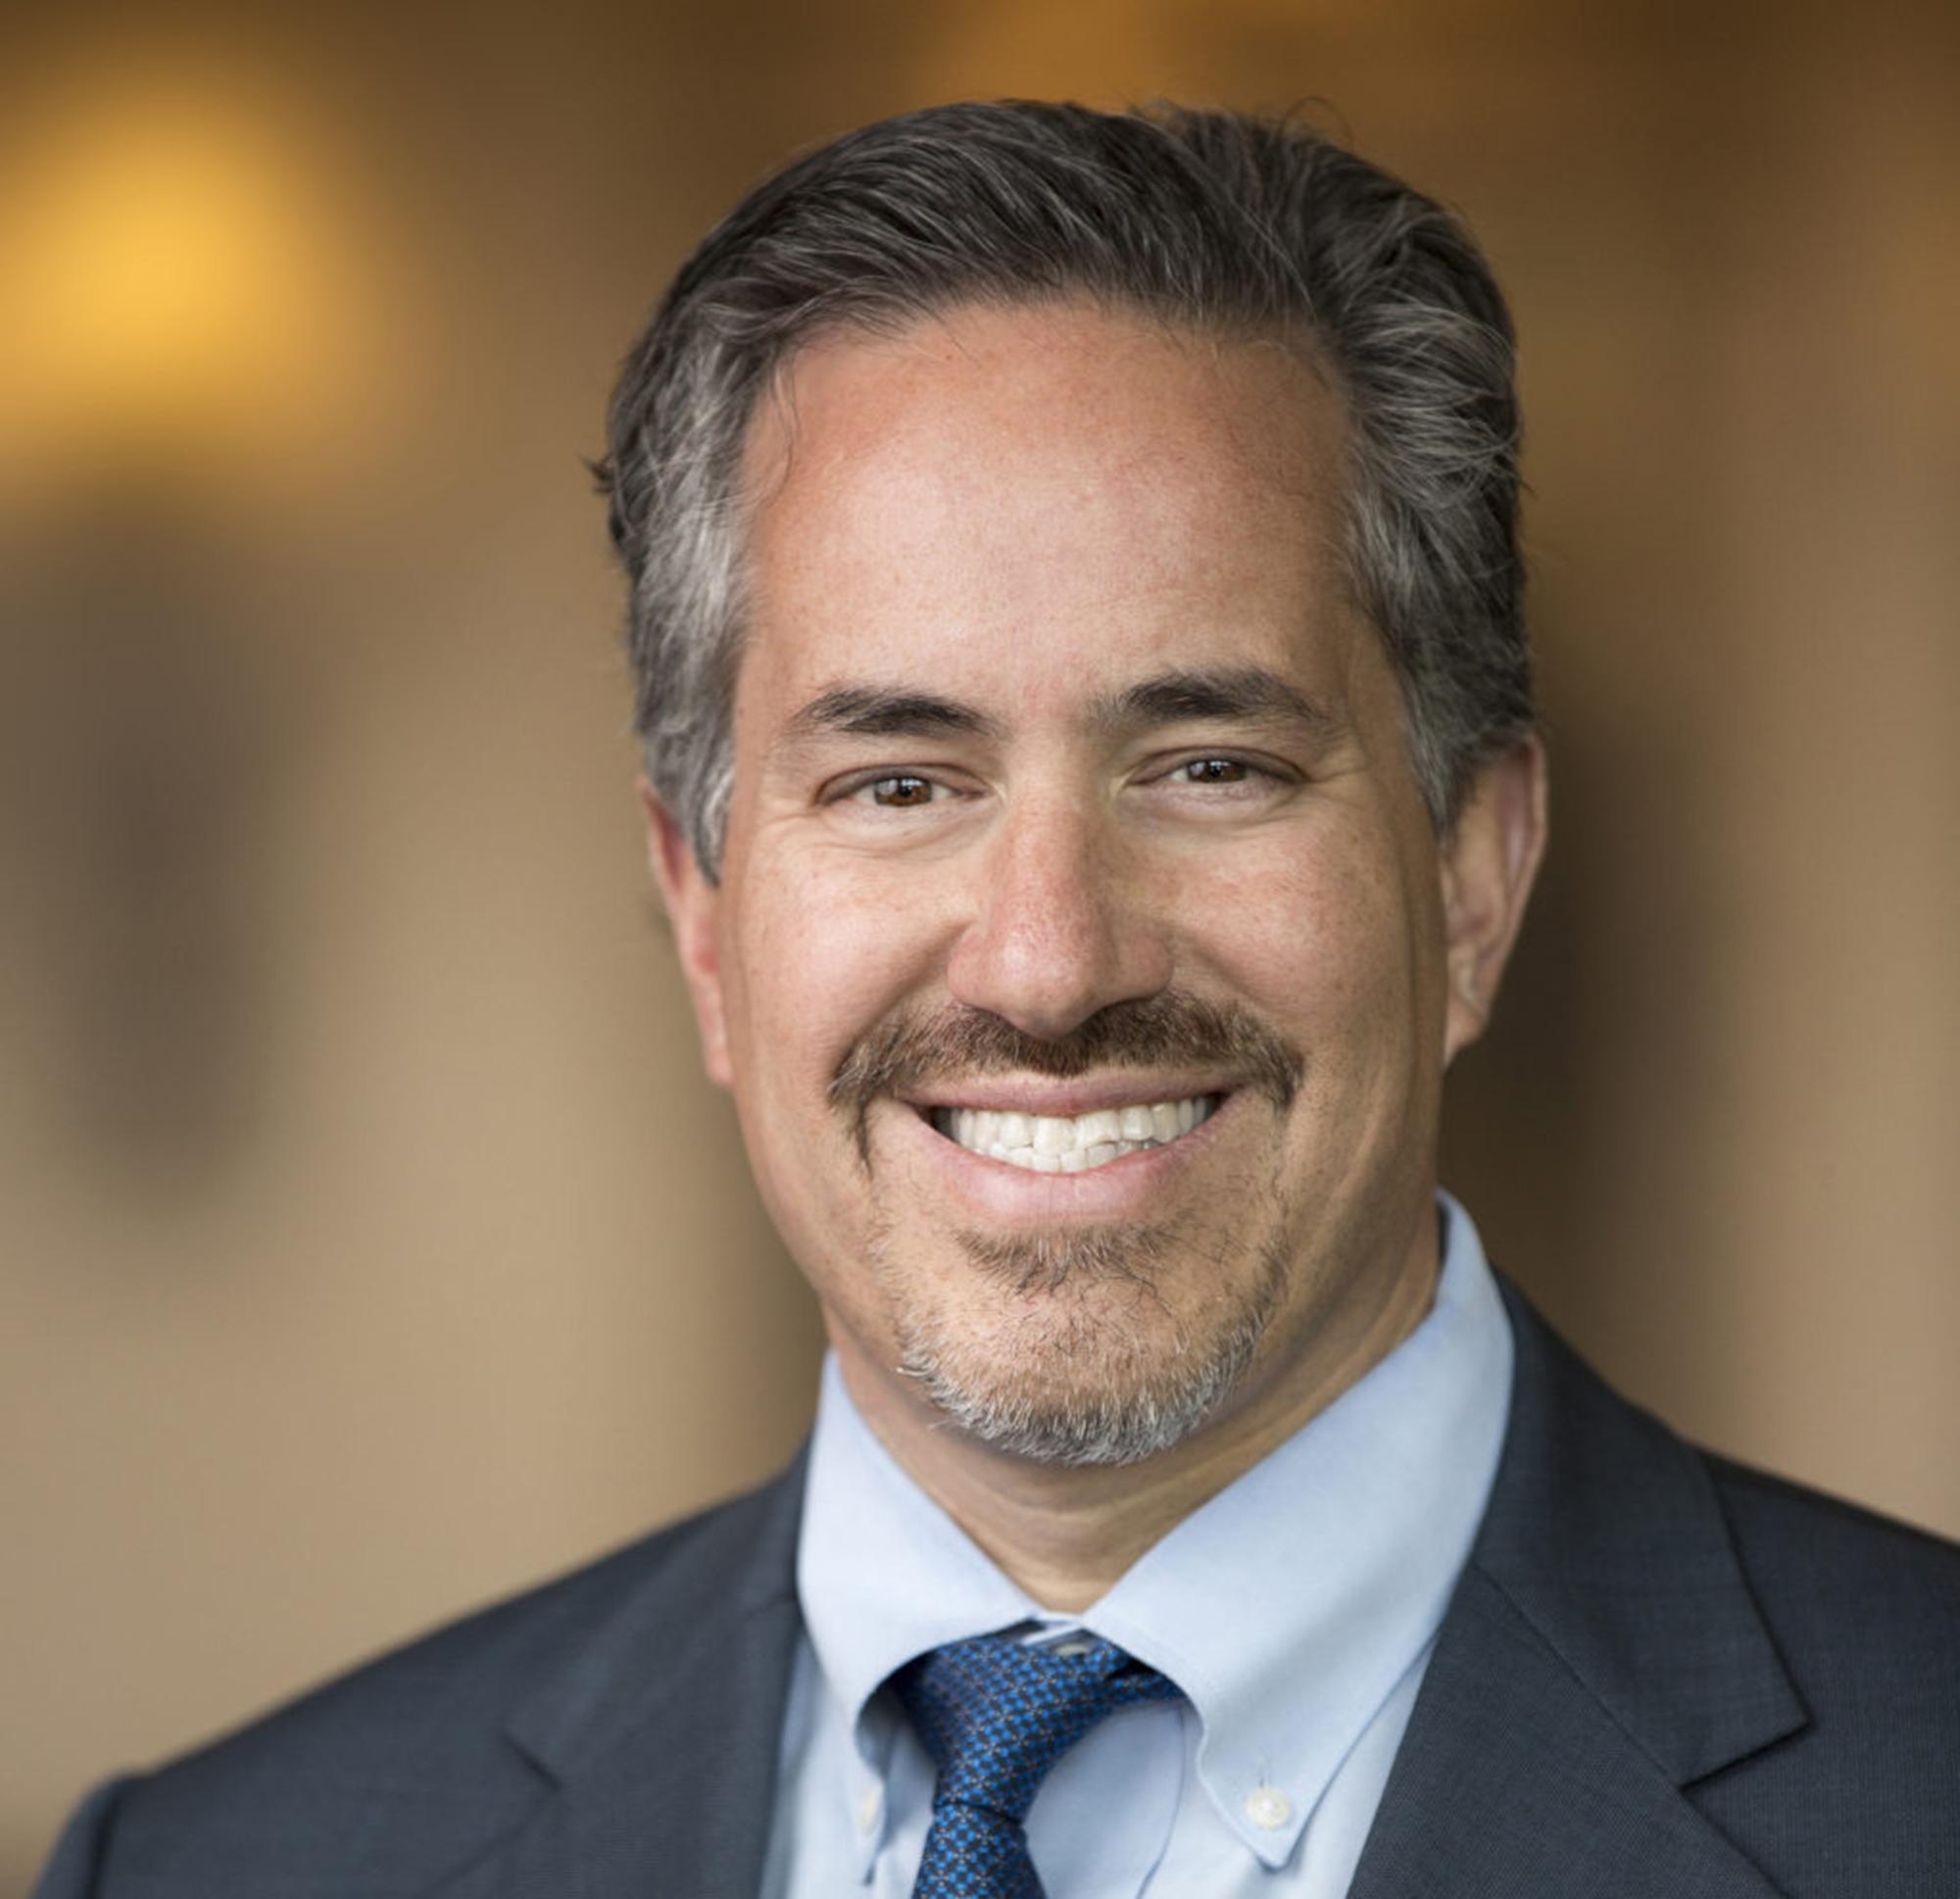 Dr  Ruben A  Mesa of Arizona's Mayo Clinic named new director of UT